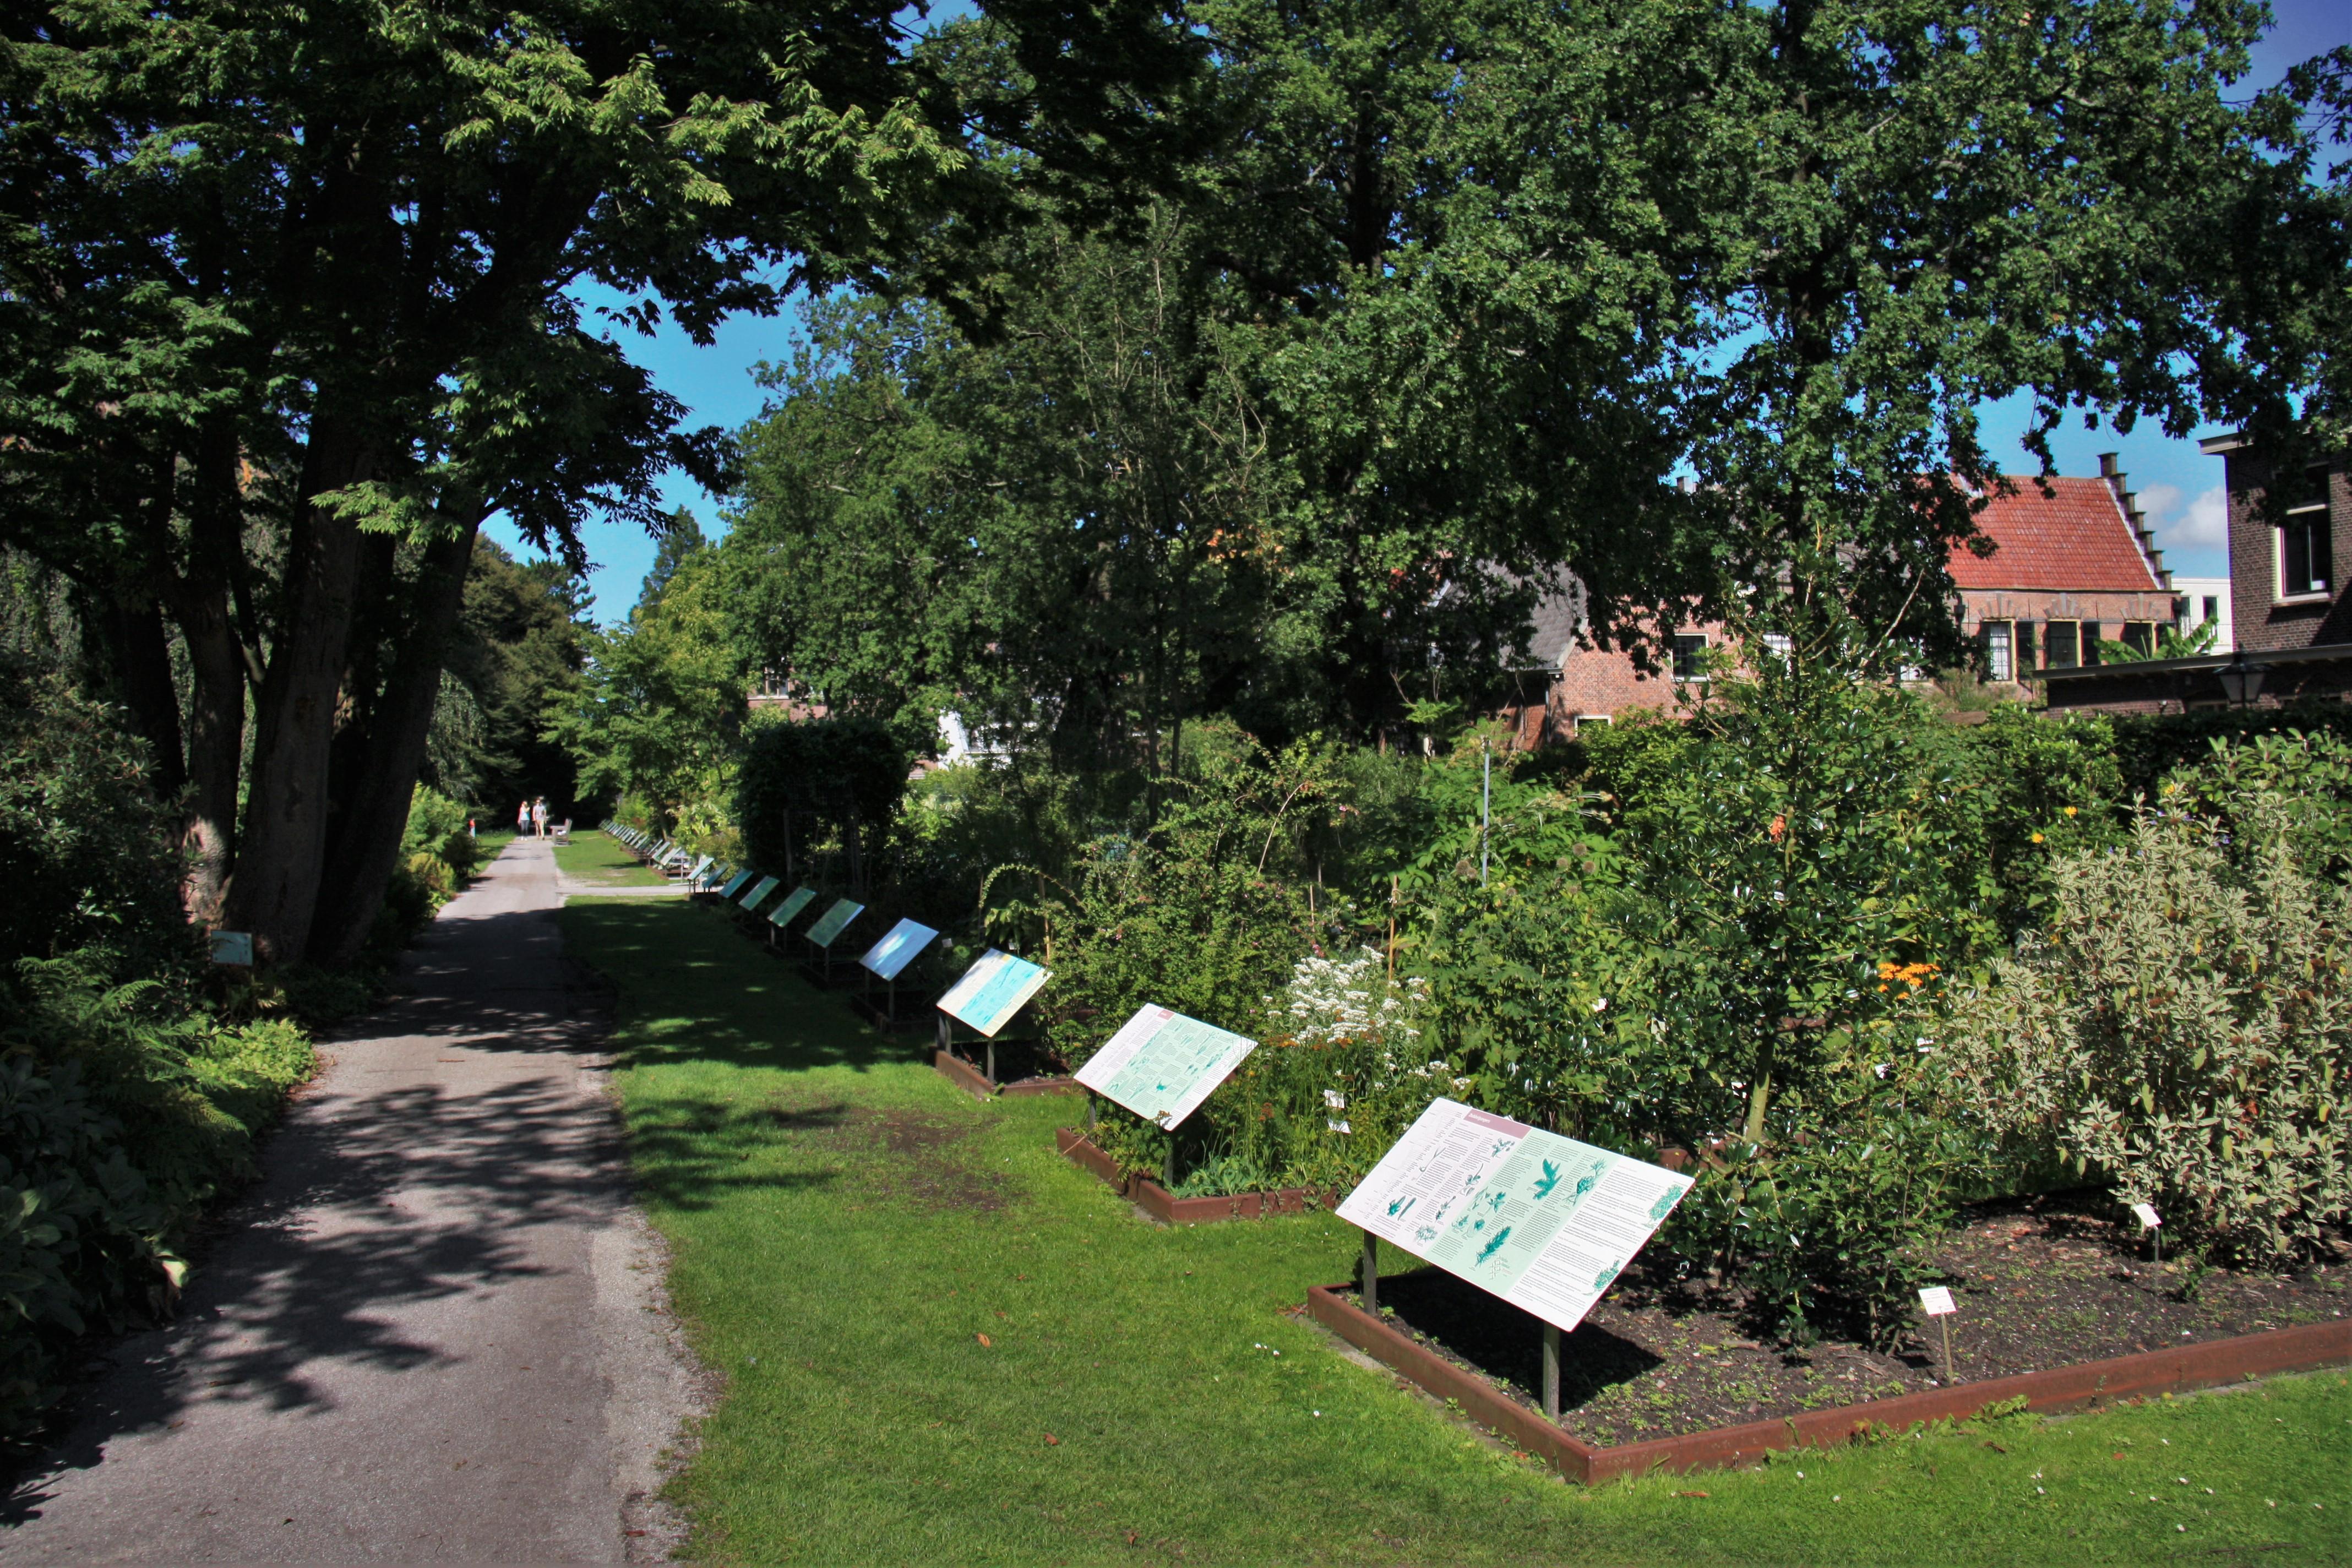 Botanische Tuin Leiden : File hortus botanicus leiden systematic garden g wikimedia